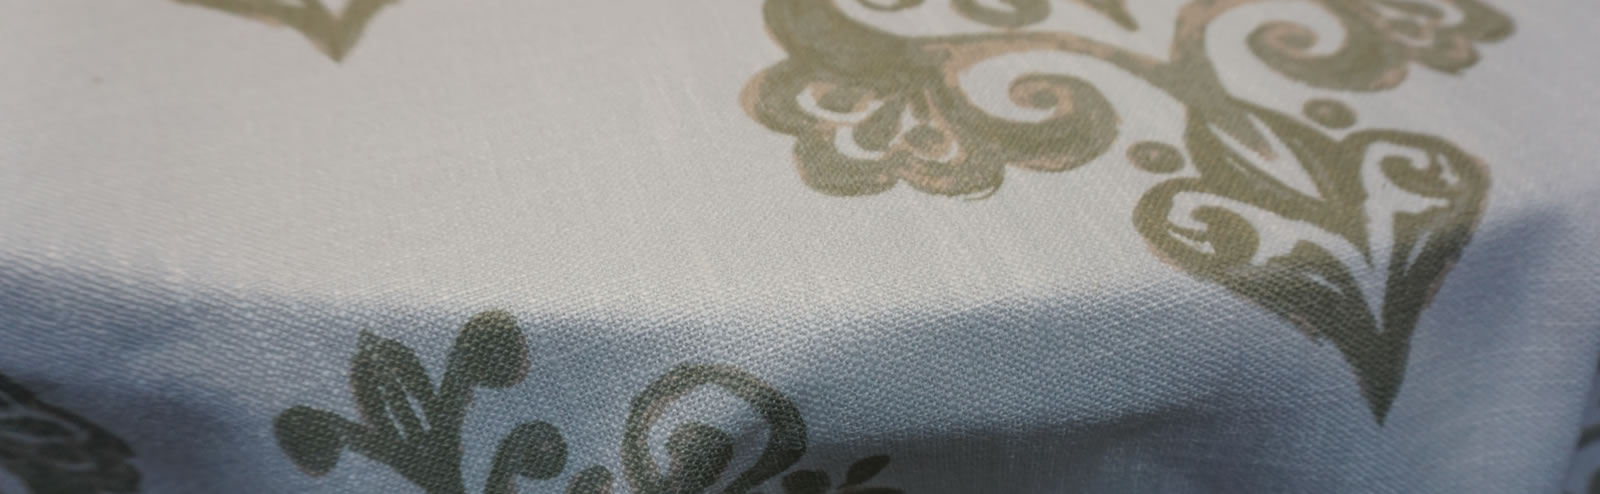 Lucca Soft Green Linen Rentals